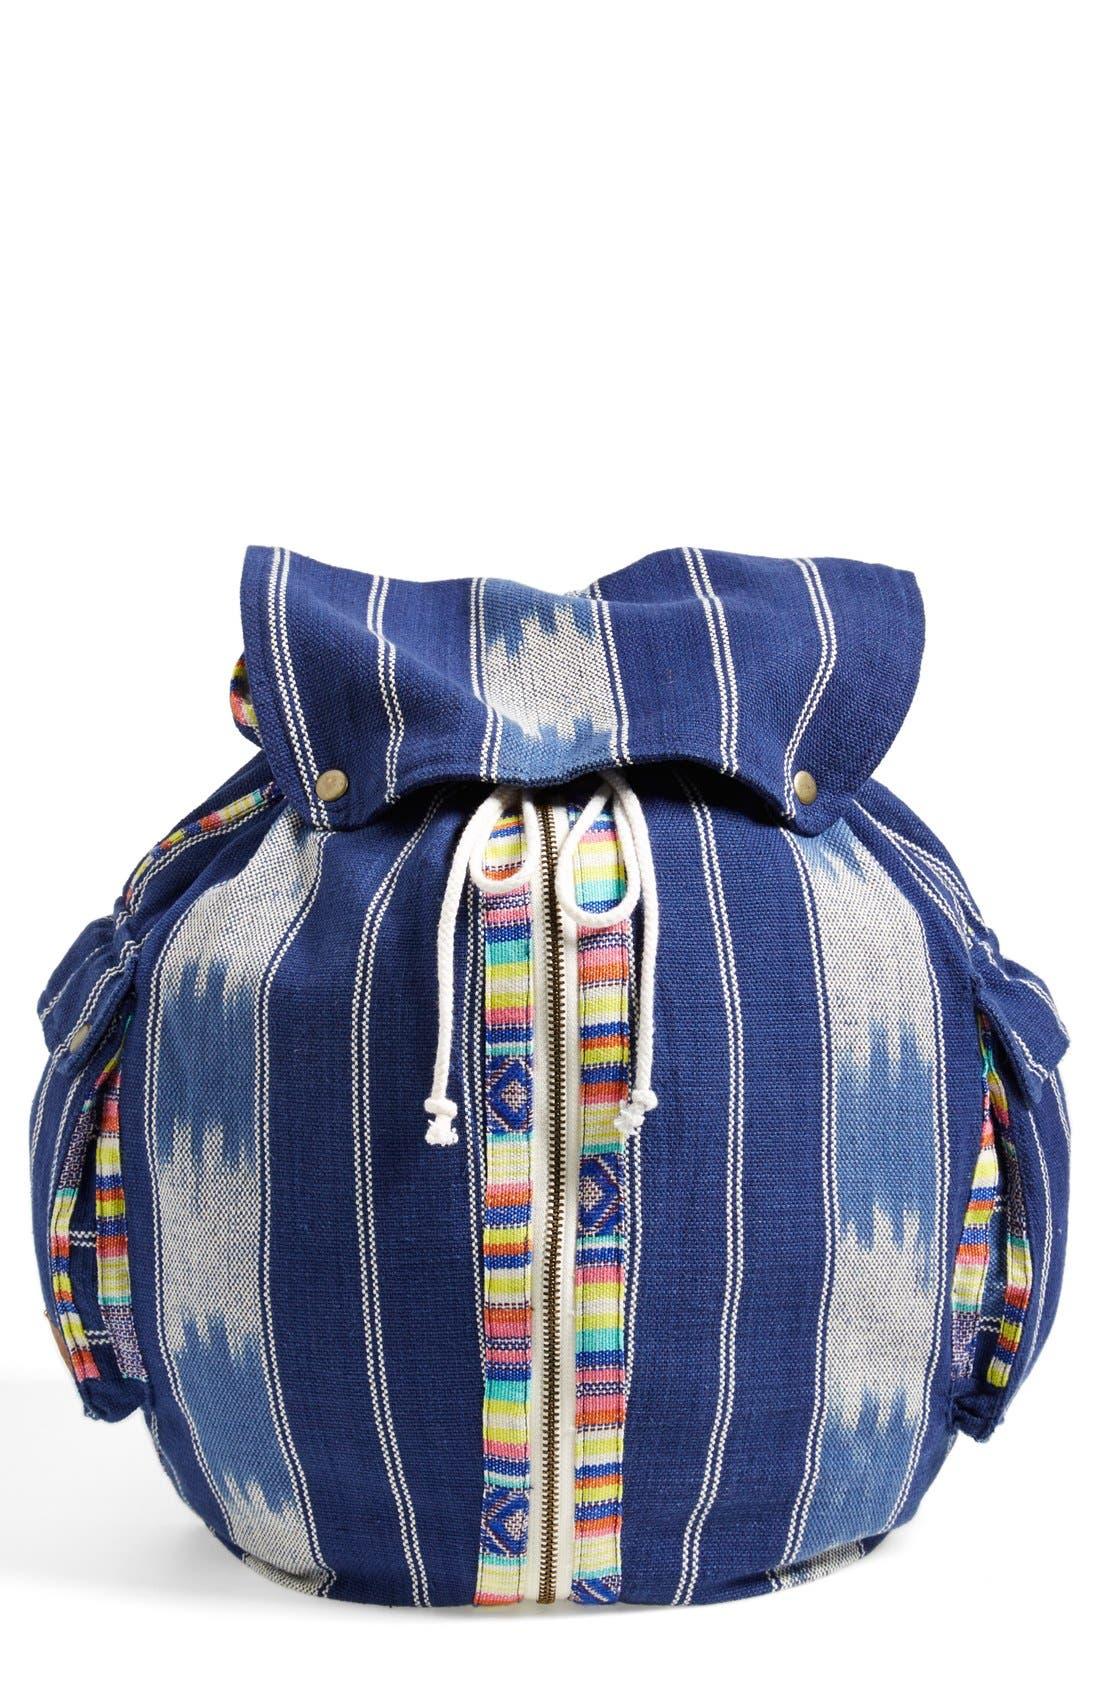 Alternate Image 1 Selected - Billabong 'Indian Surf' Woven Backpack